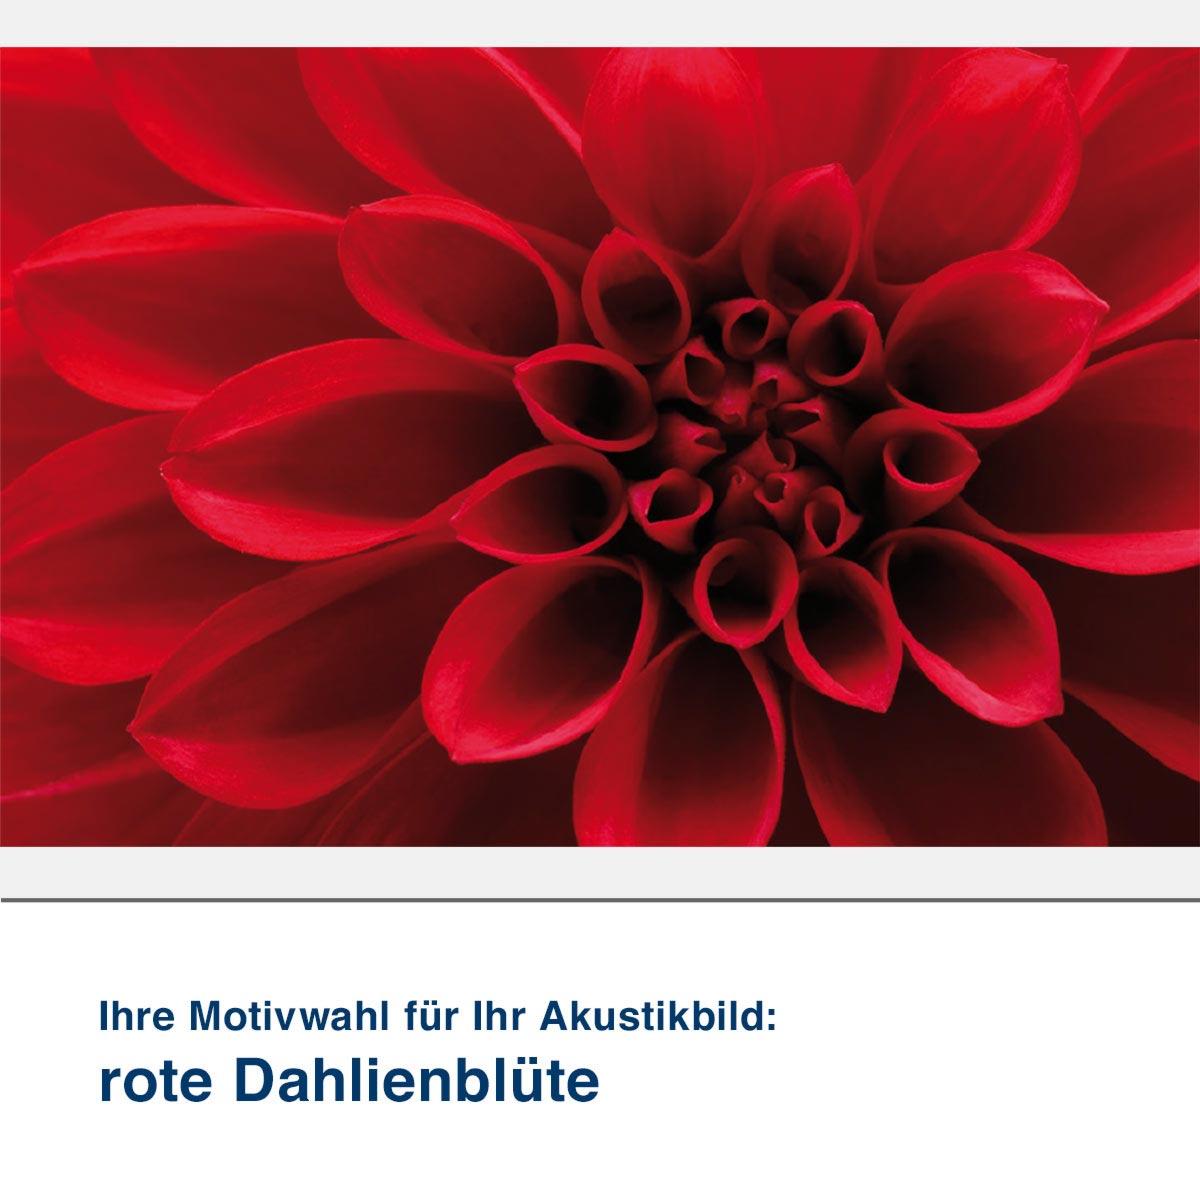 Akustikbild Motiv rote Dahlienblüte